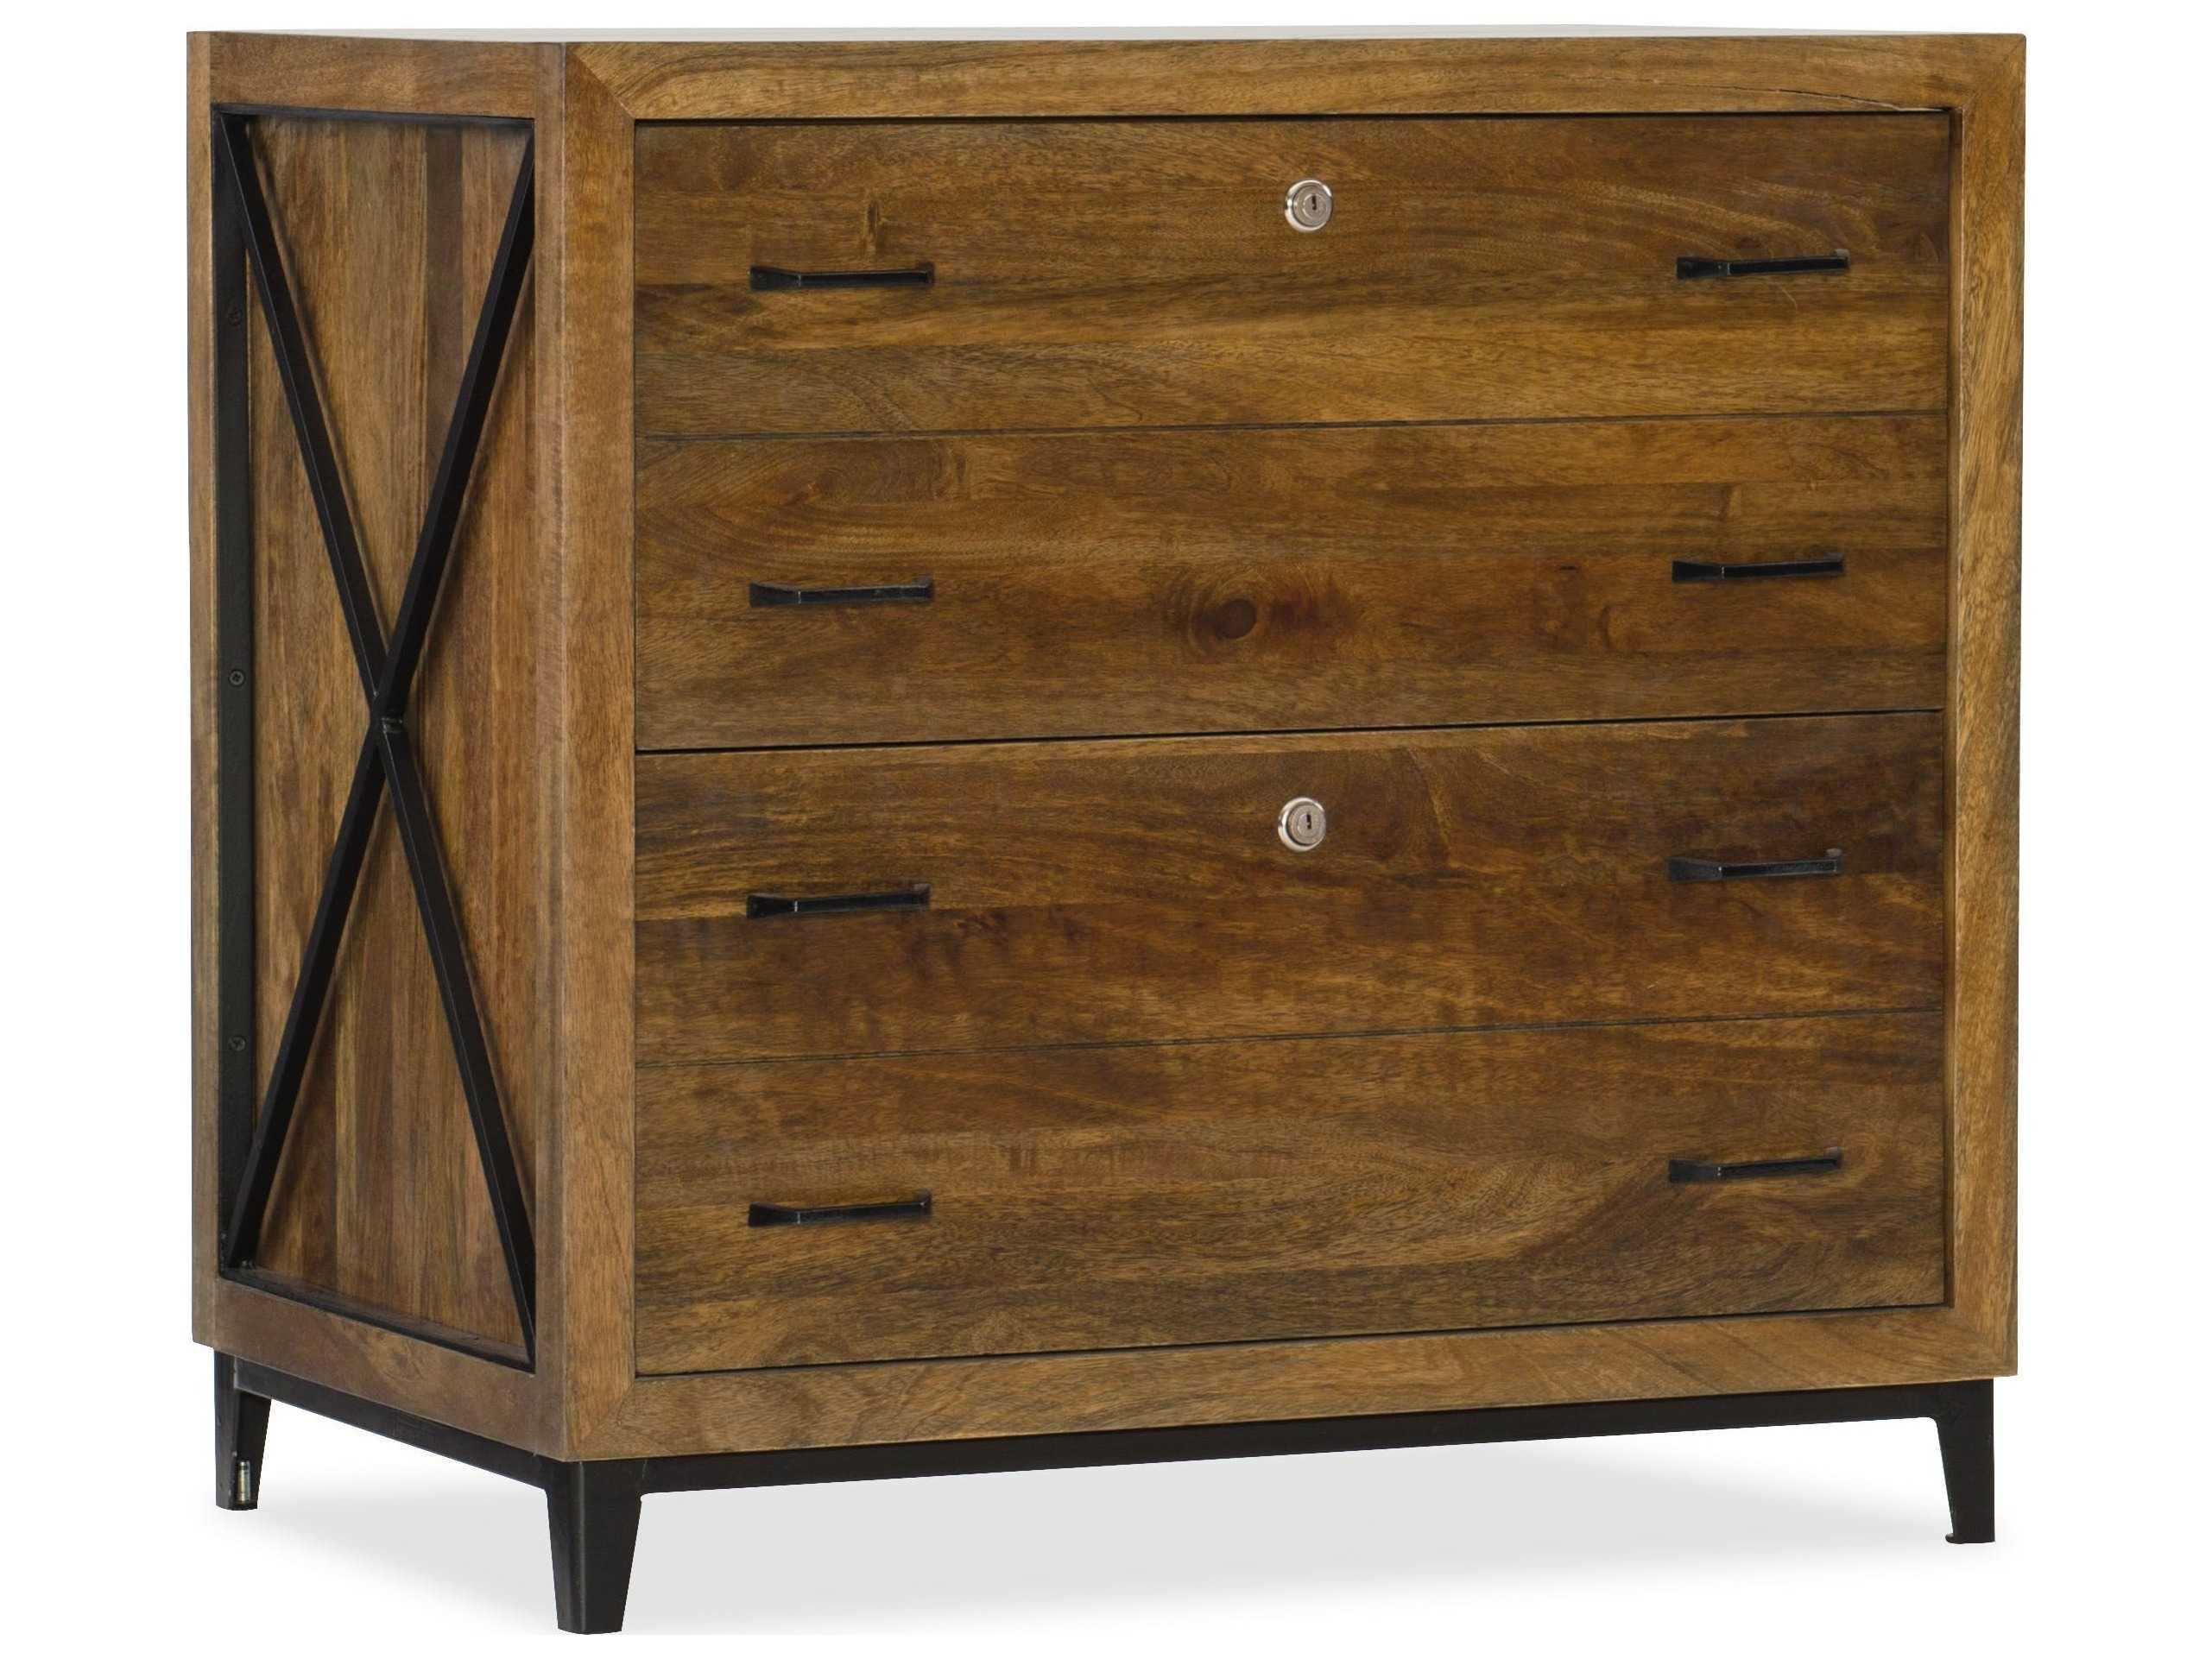 Hooker Furniture Rustique Medium Wood Lateral File Cabinet